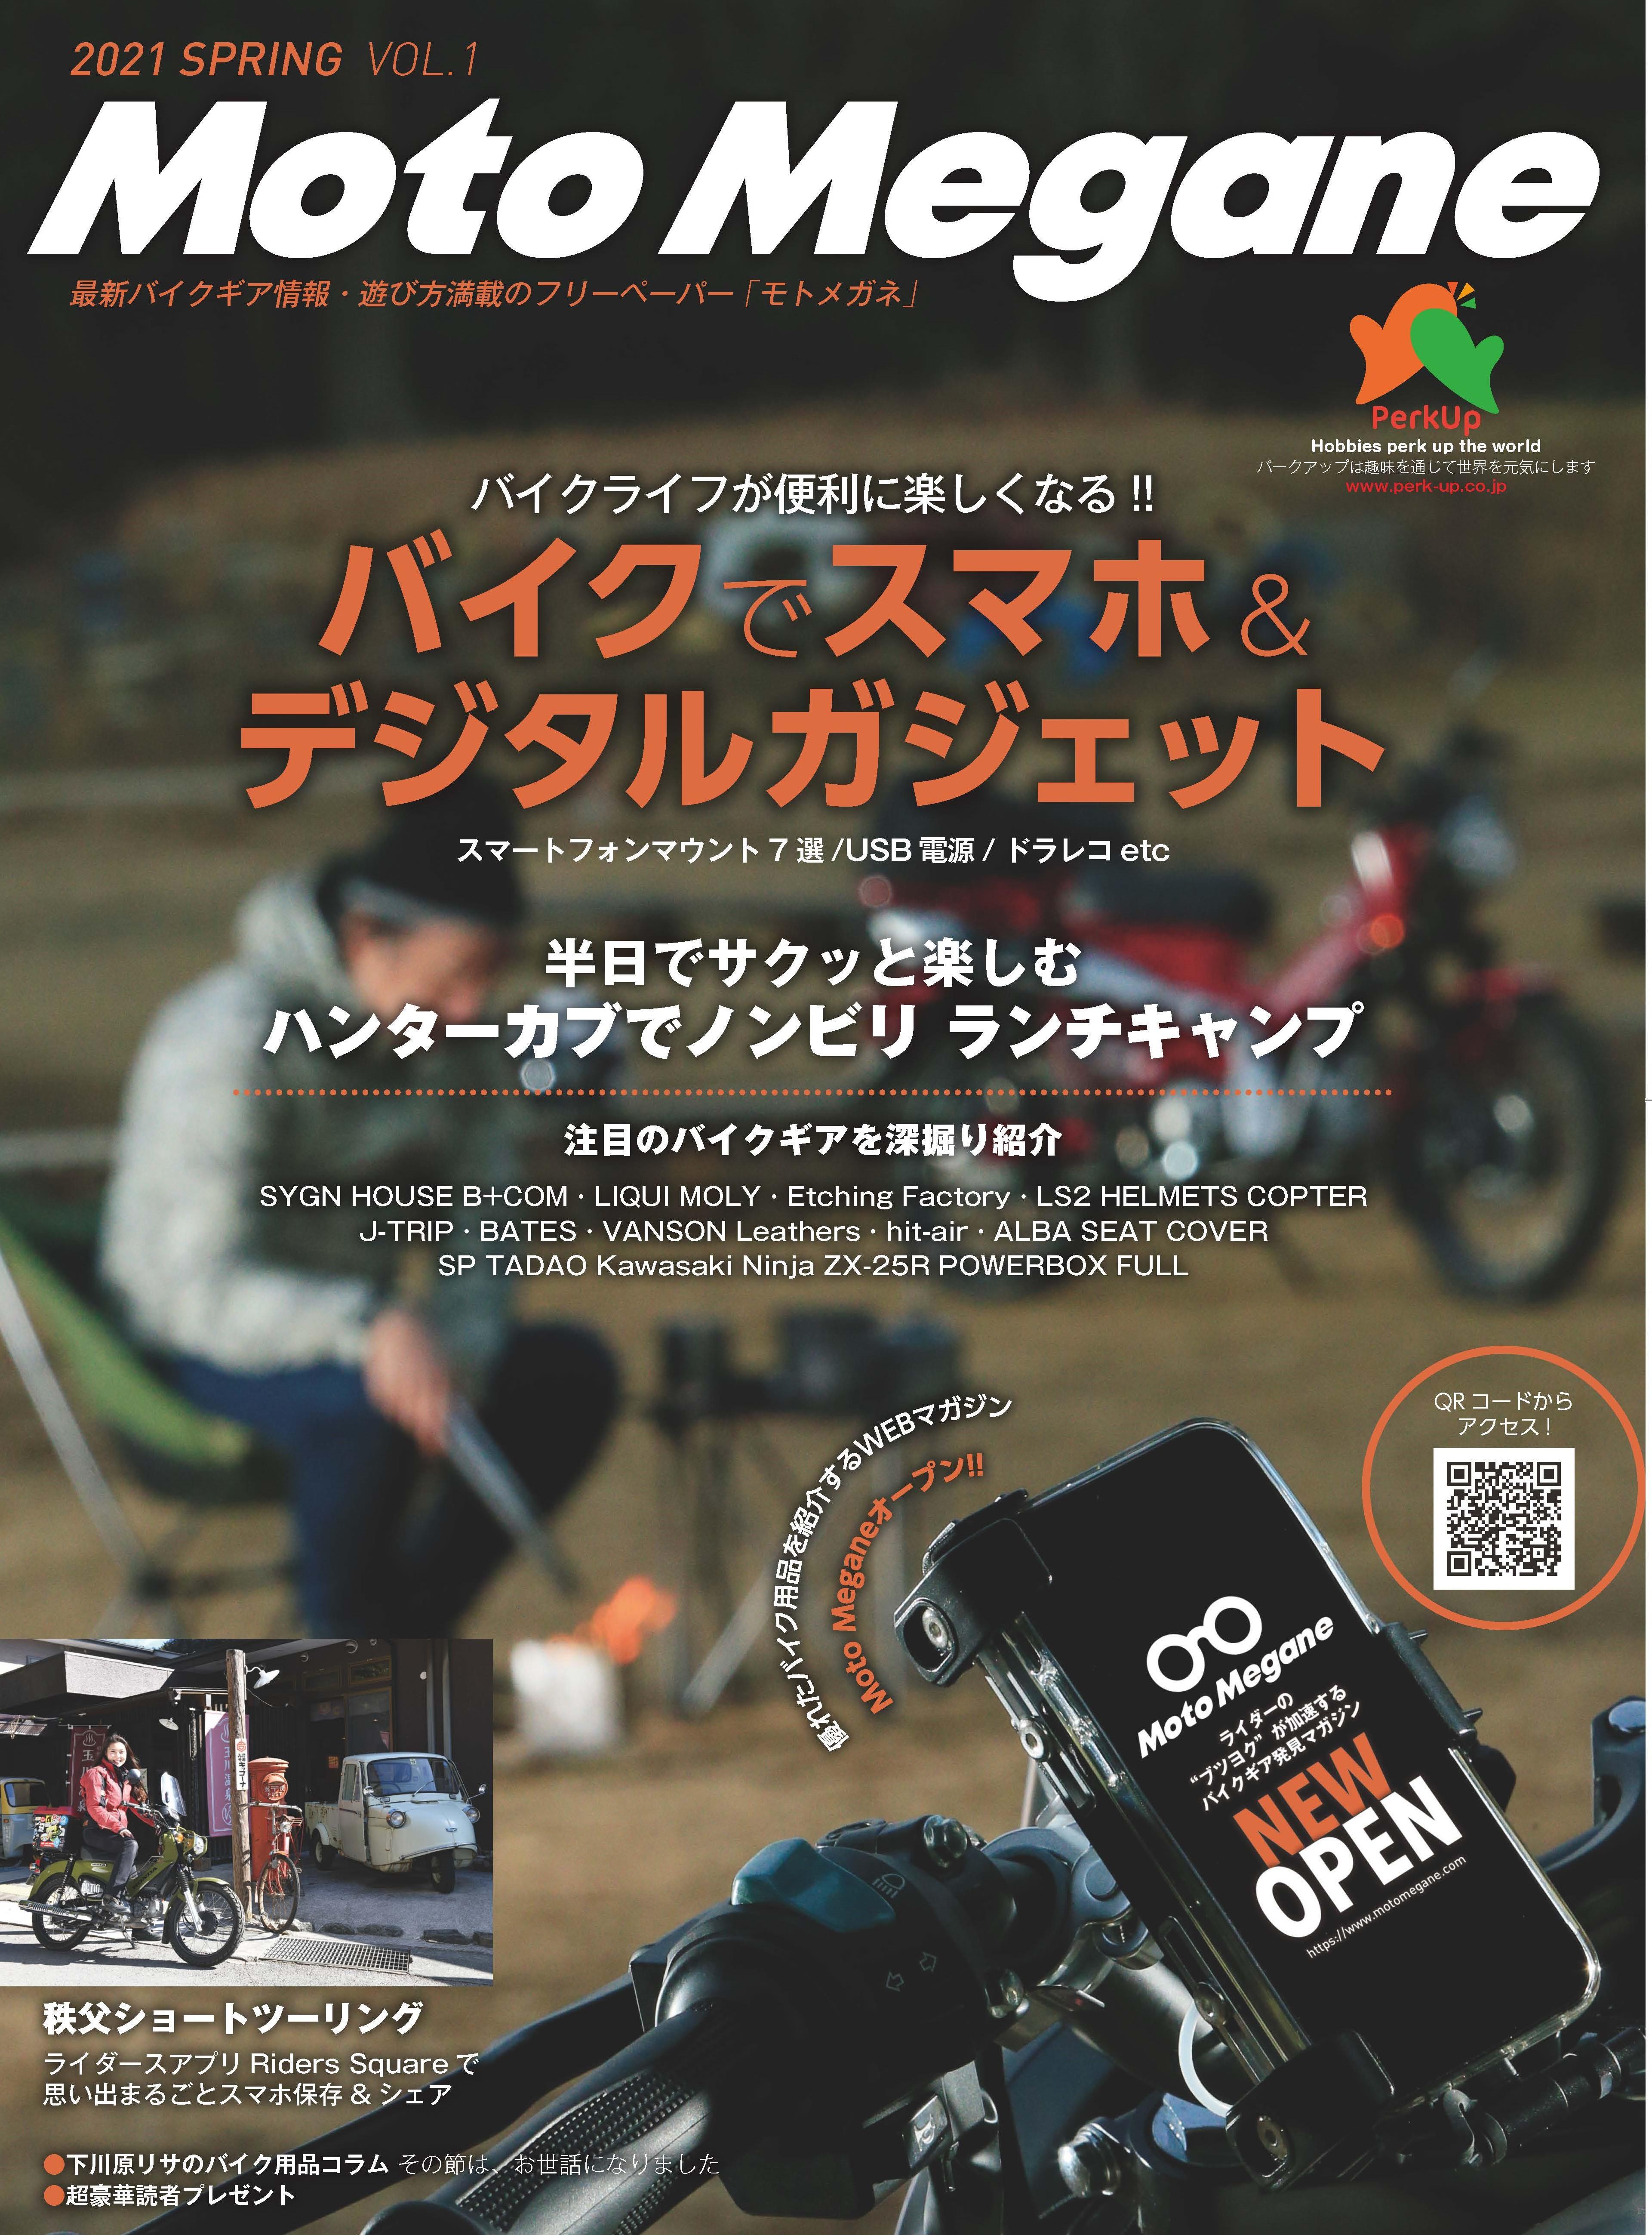 【Moto Megane VOL.1掲載】B+COM SB6X / ONE